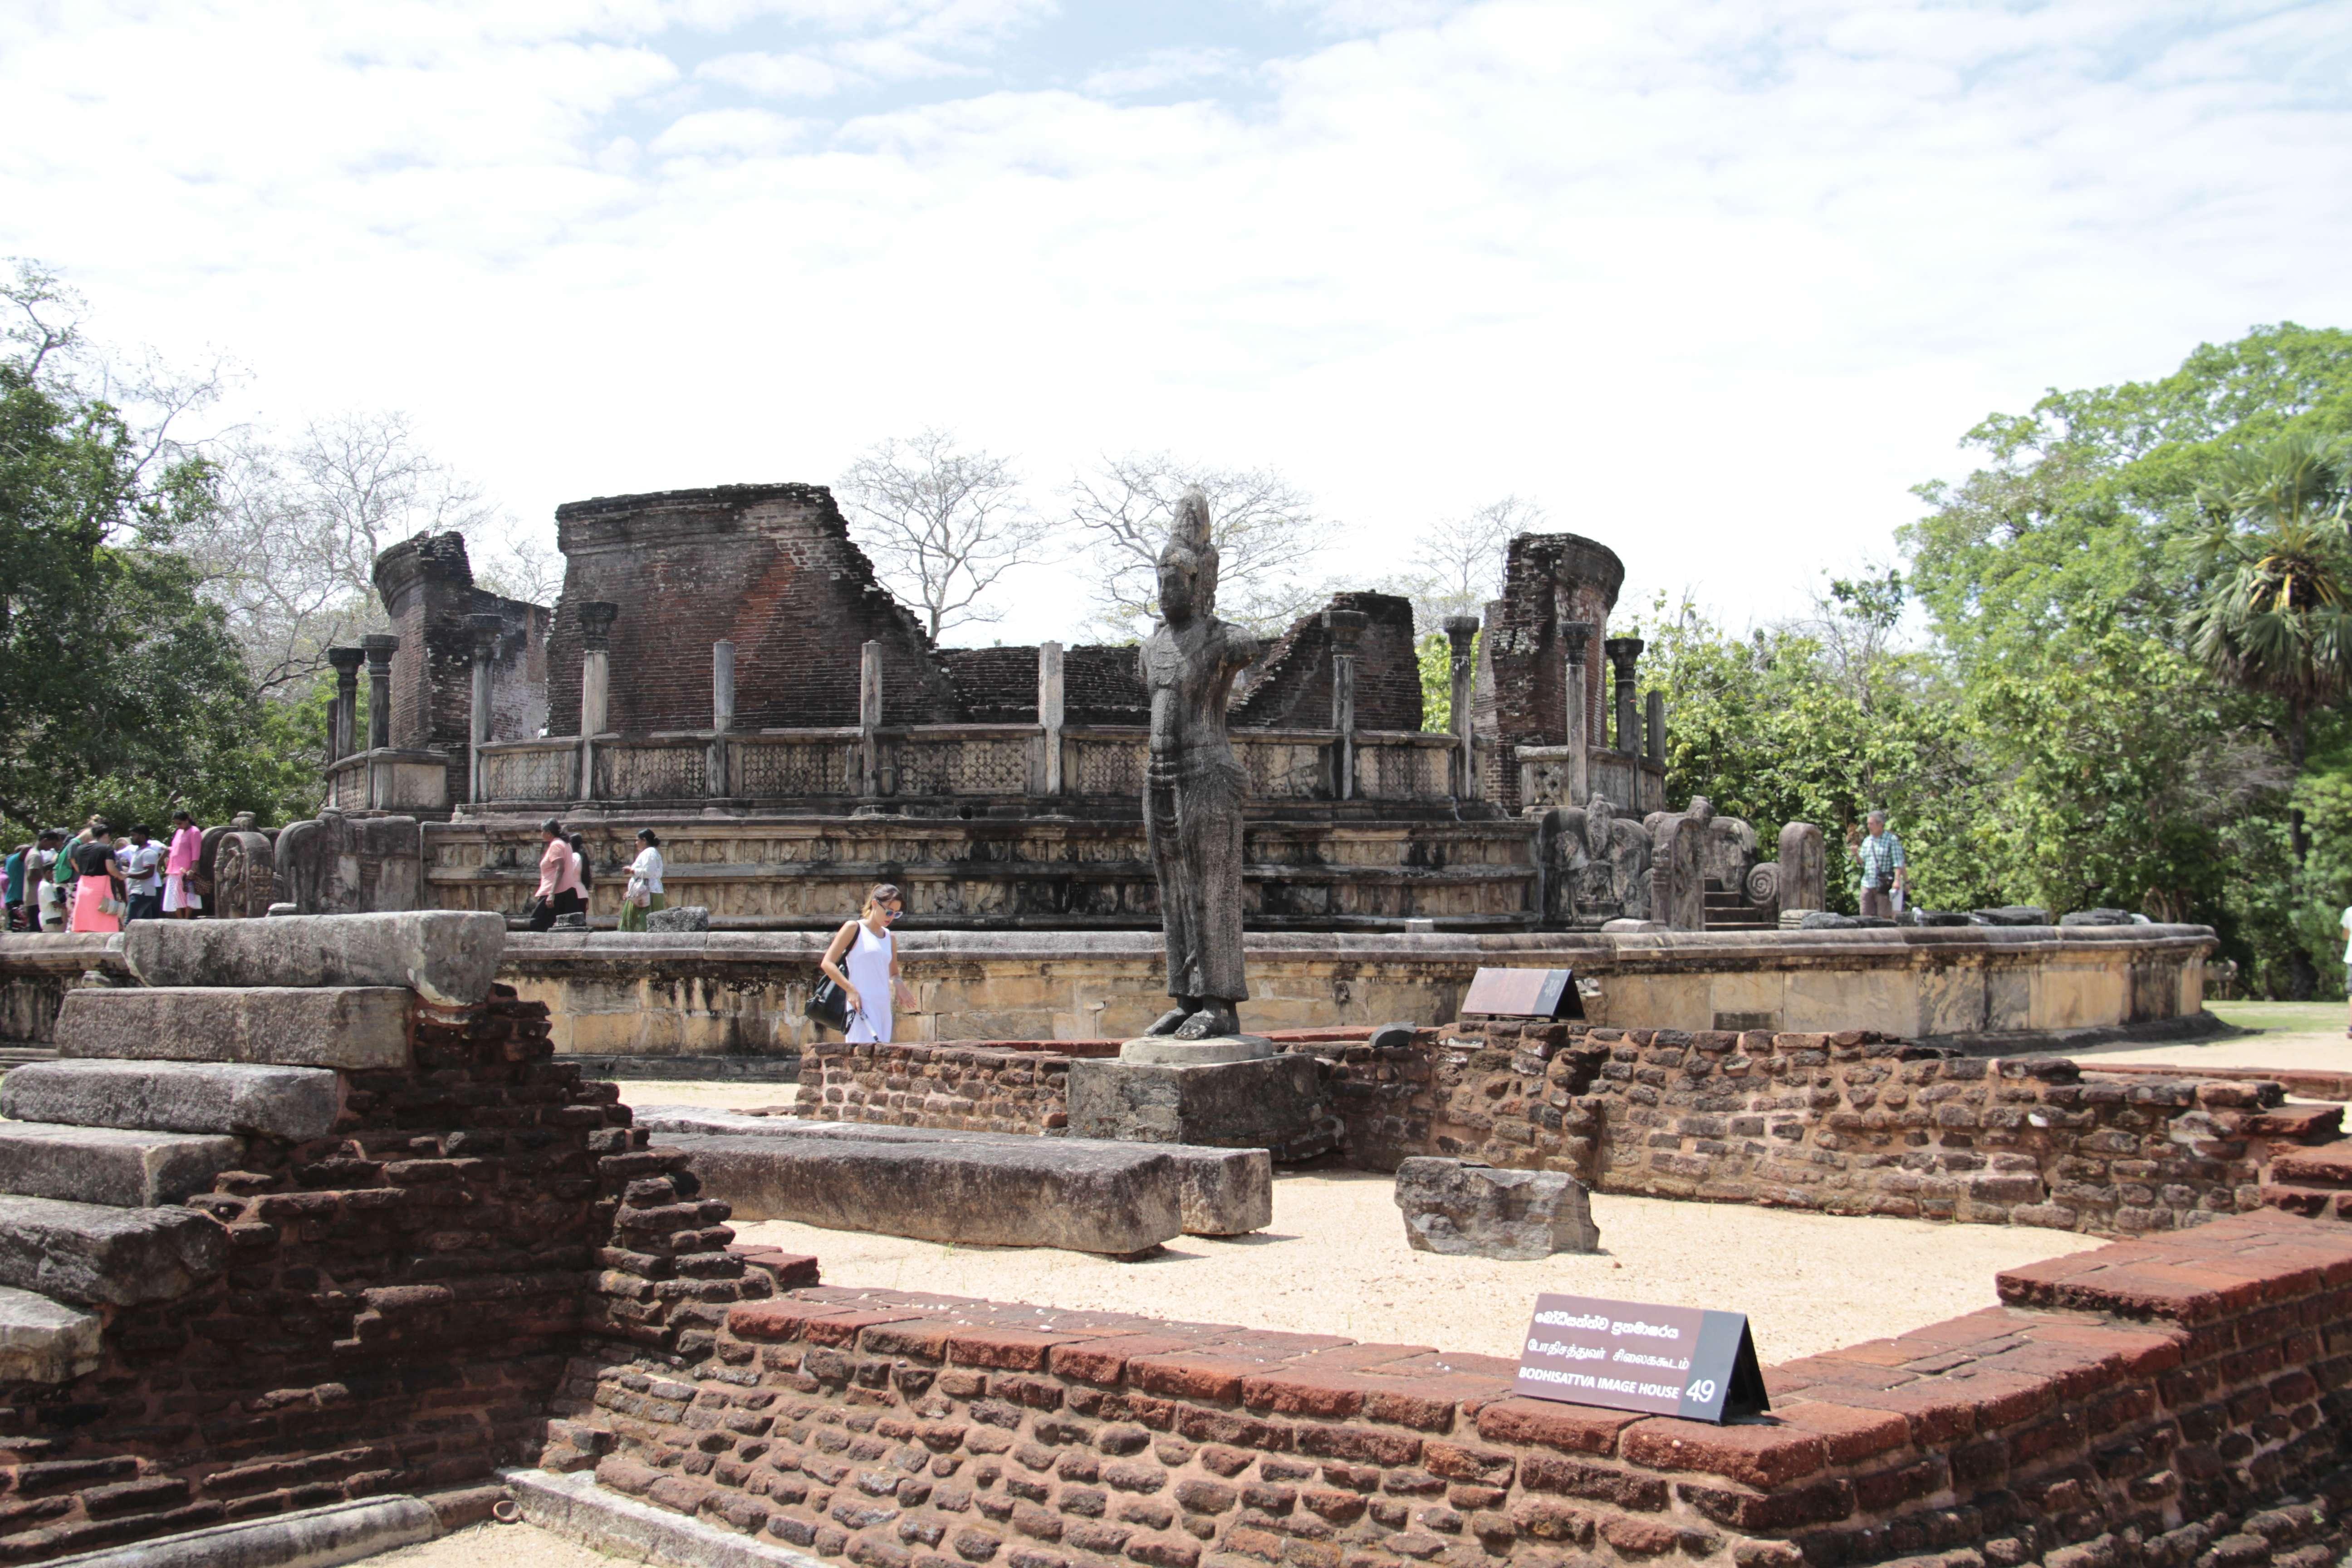 Sri Lanka aout 2017_0267 Polonnaruwa terrasse de la relique de la dent Atadage